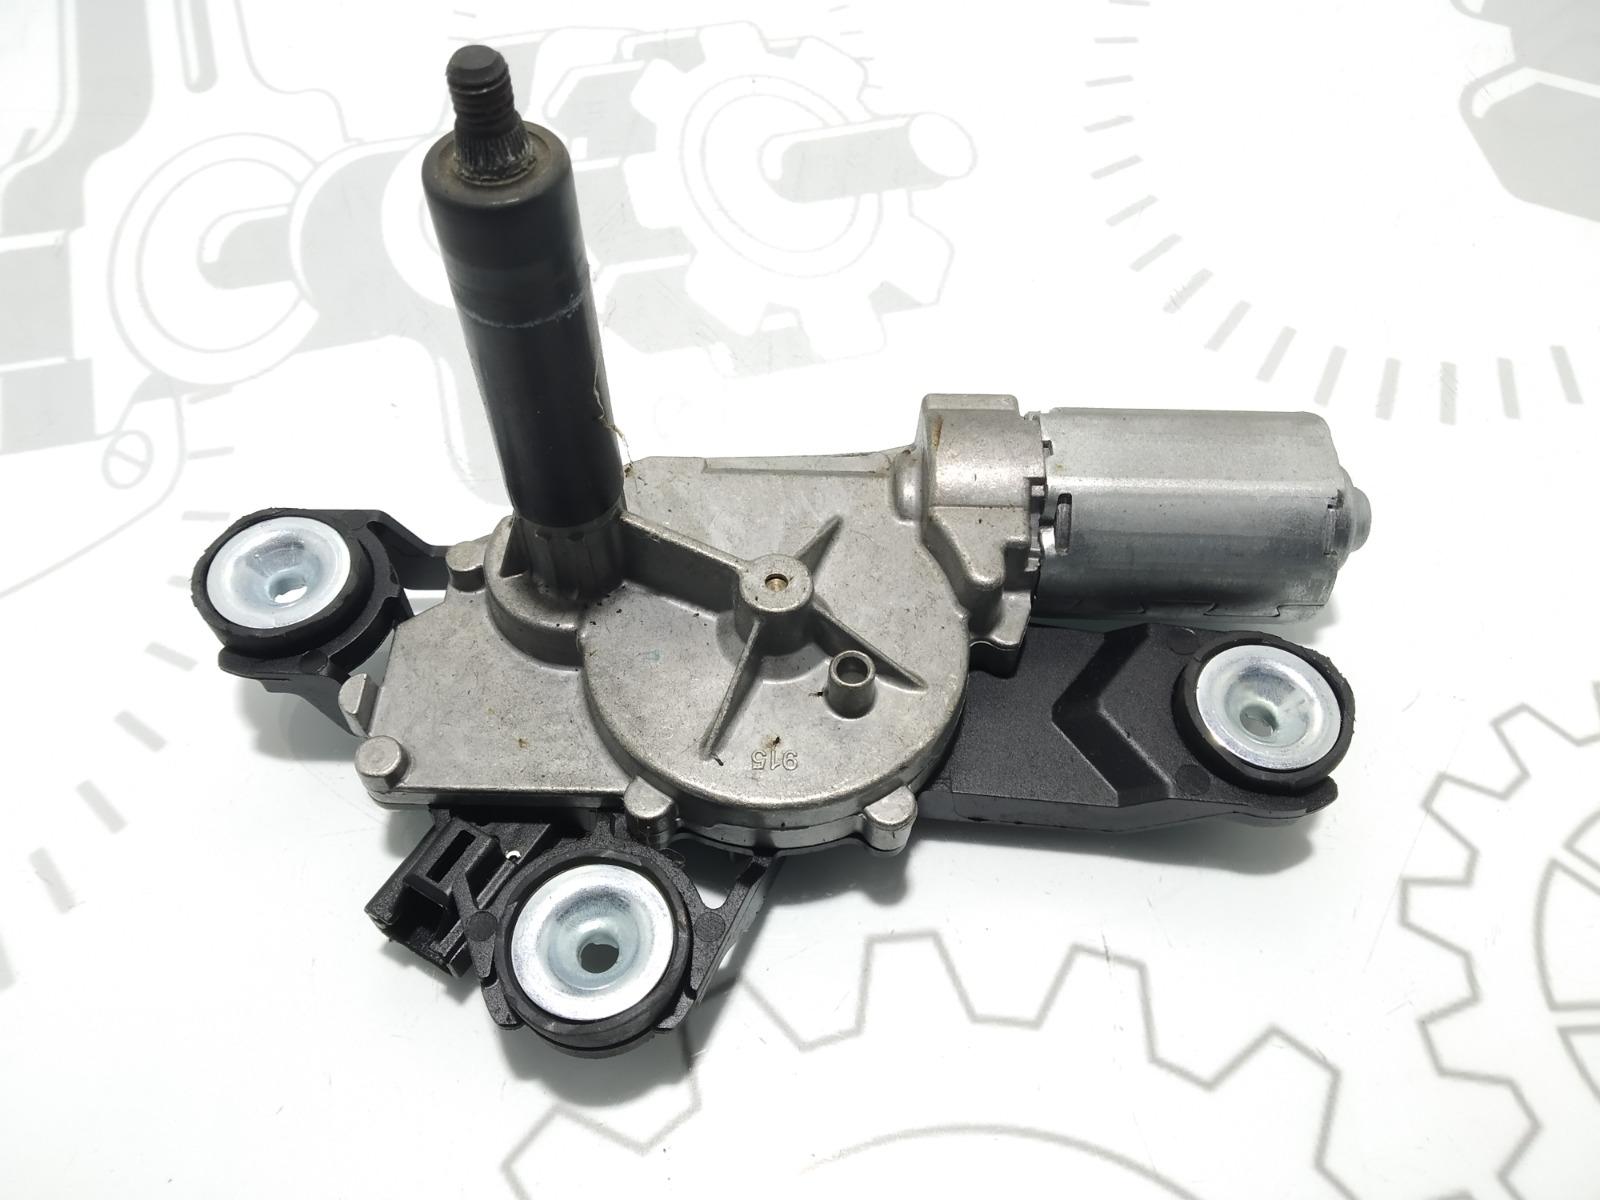 Моторчик заднего стеклоочистителя (дворника) Ford C-Max 2.0 I 2006 (б/у)